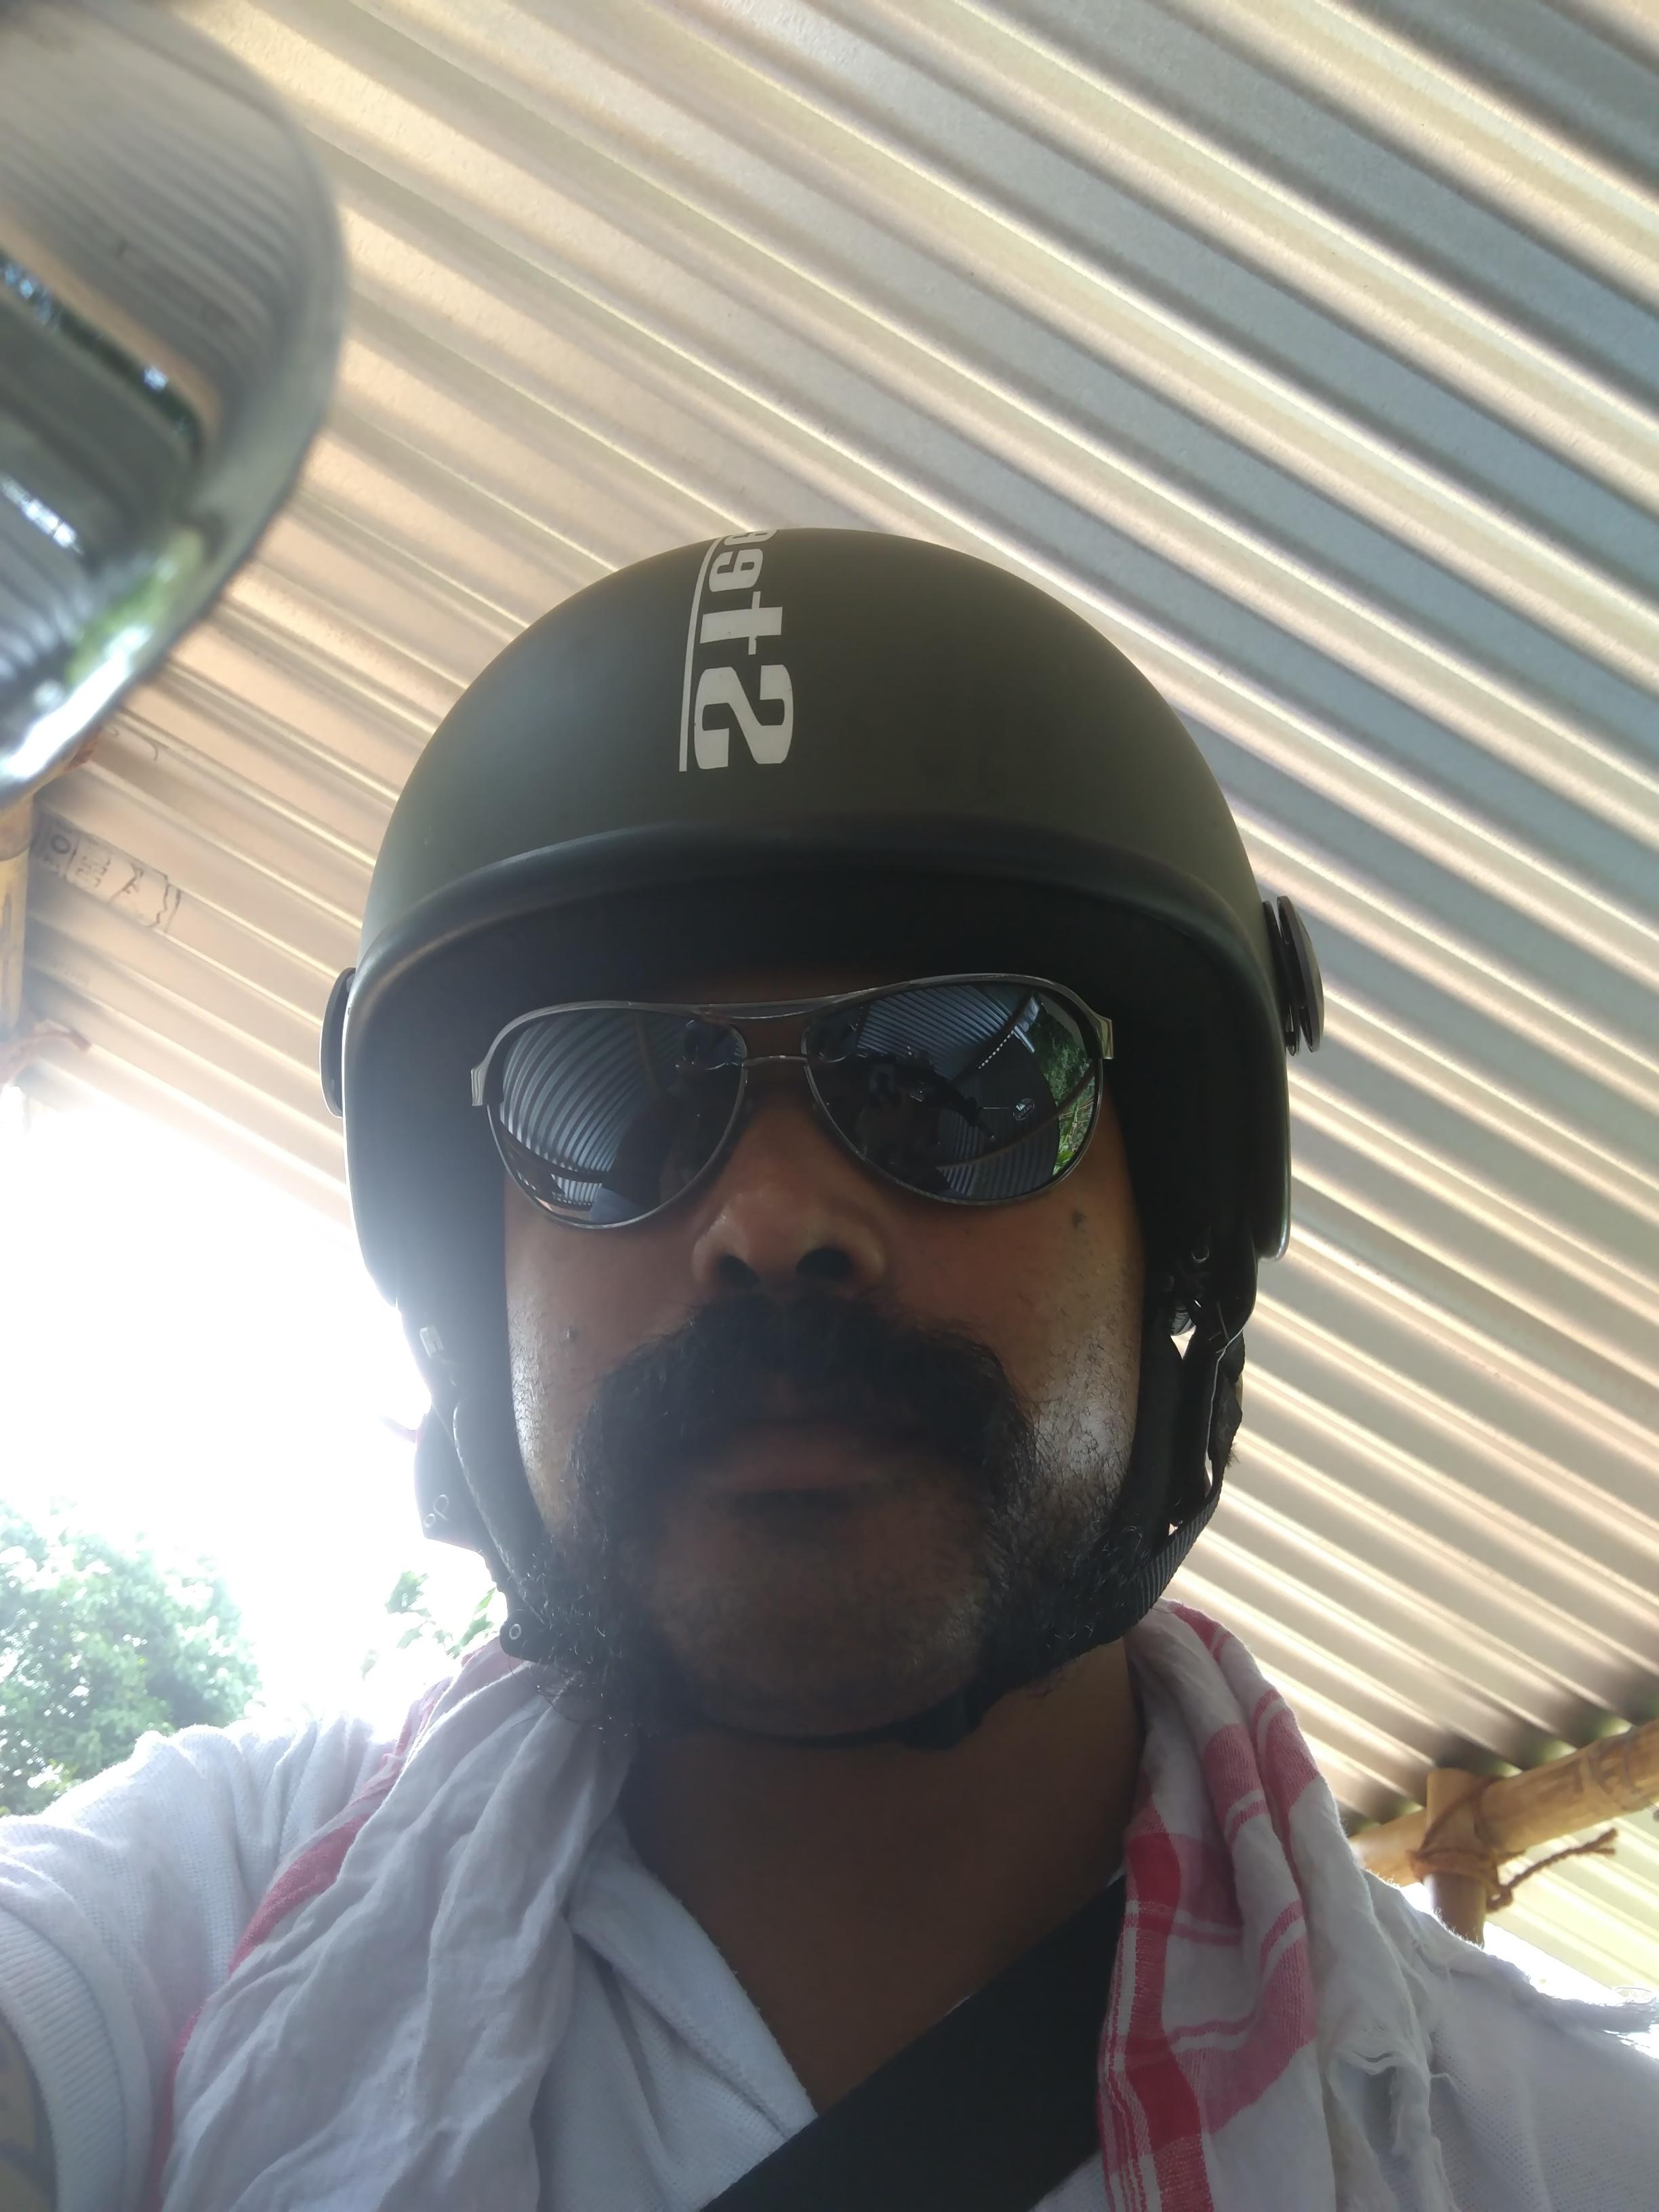 Ride Image by Rikrakchism Sangma